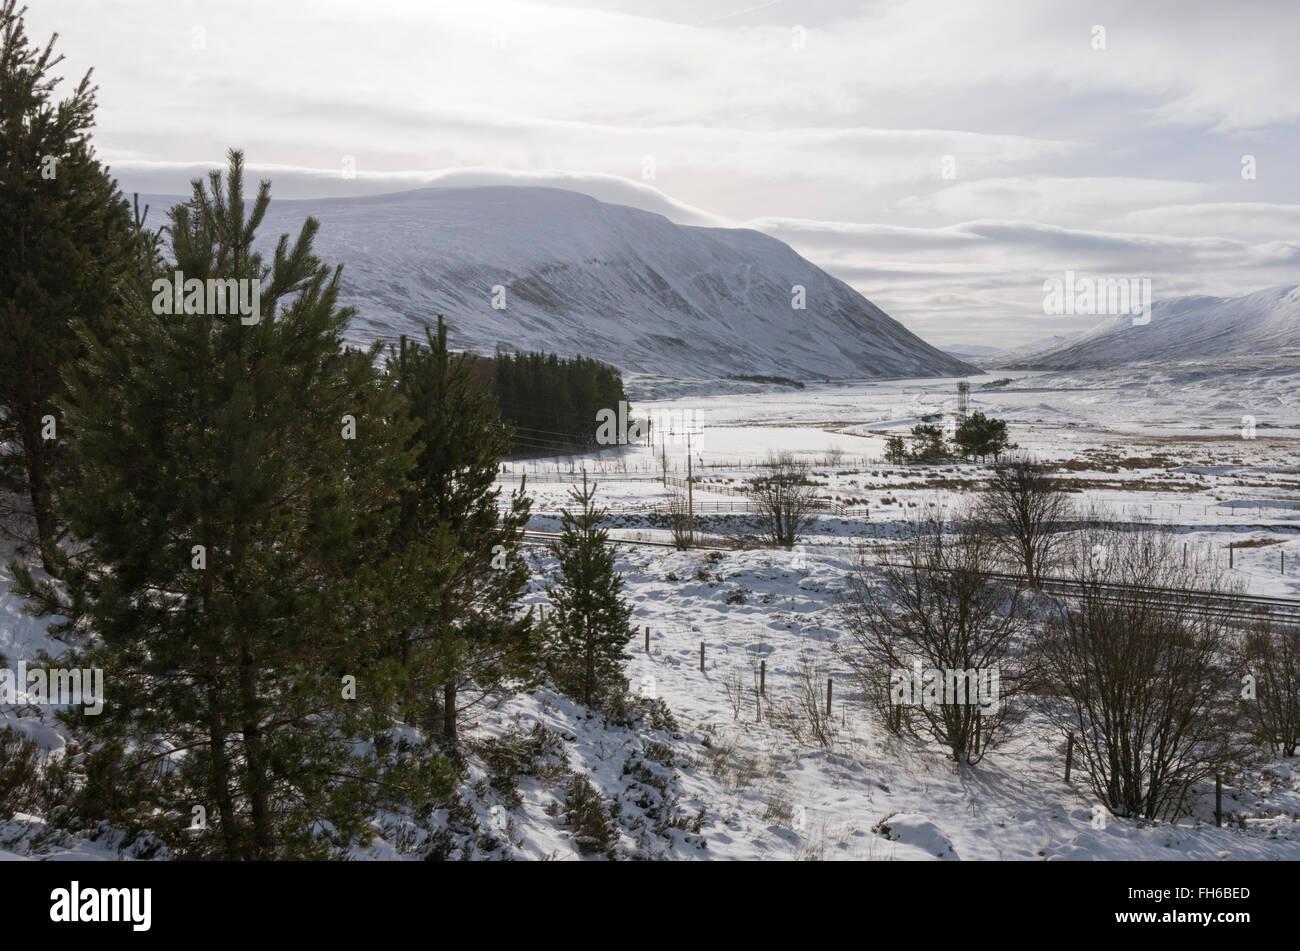 Scottish Highlands winter landscape looking southwest to Loch Garry from Dalnaspidal,Perthshire,Scotland,UK. - Stock Image